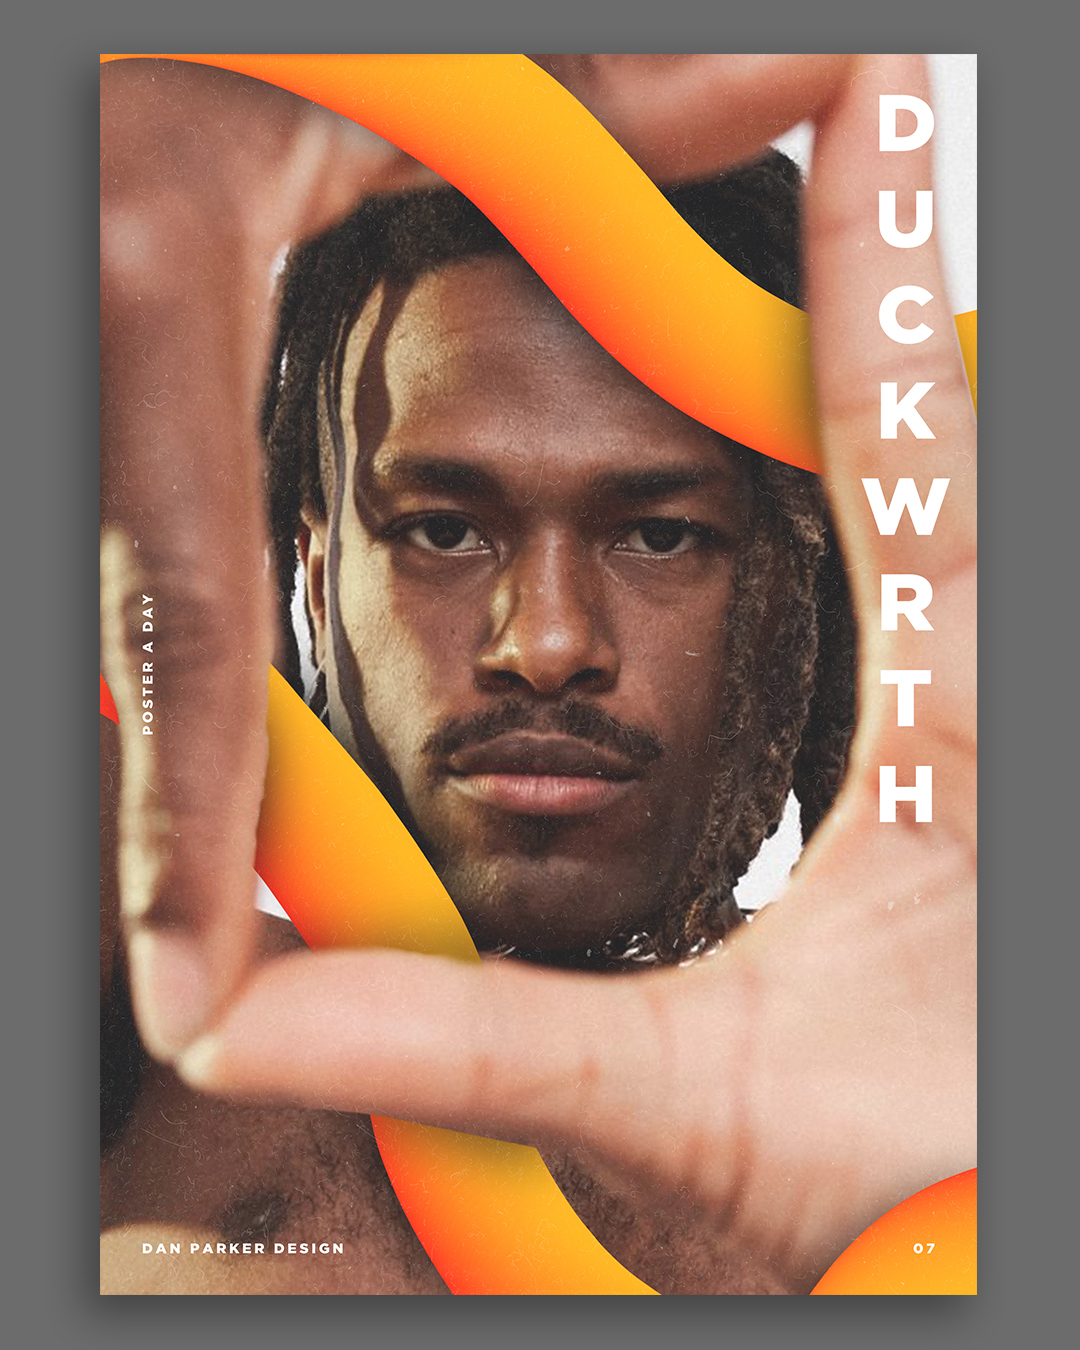 #7 - Duckwrth Mockup.jpg